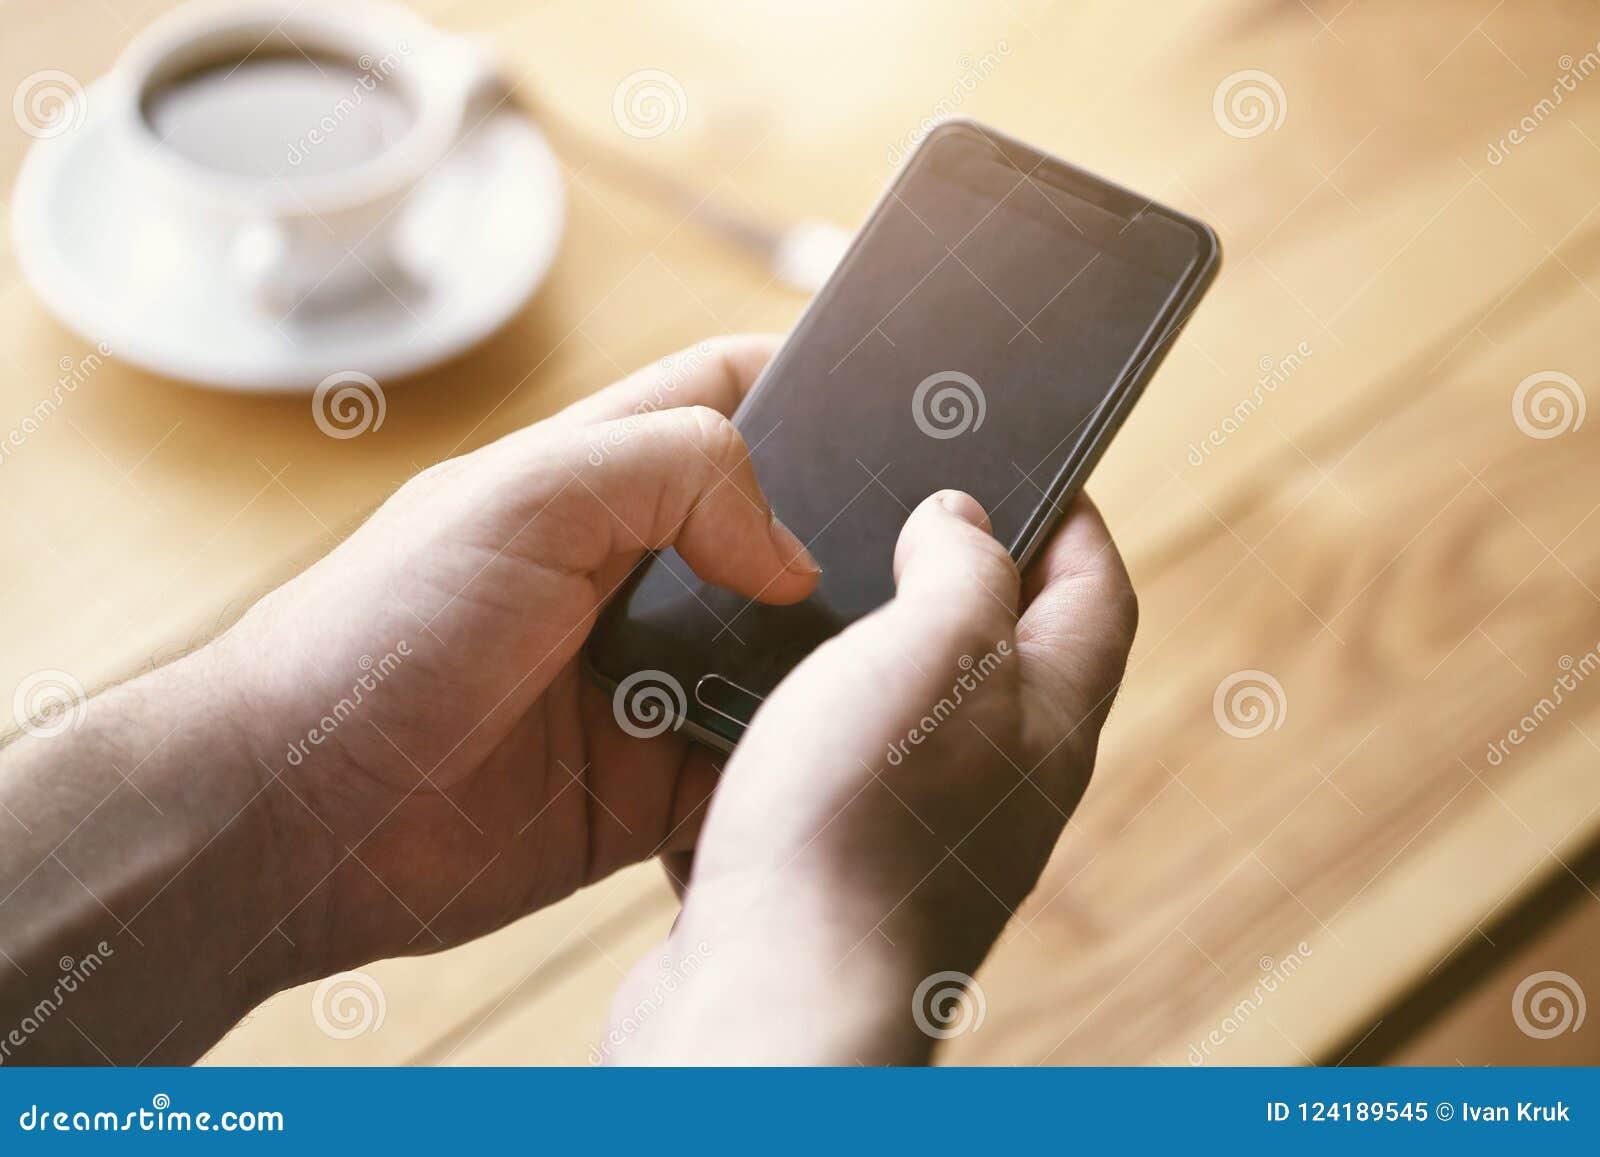 Hands using smart phone touching screen